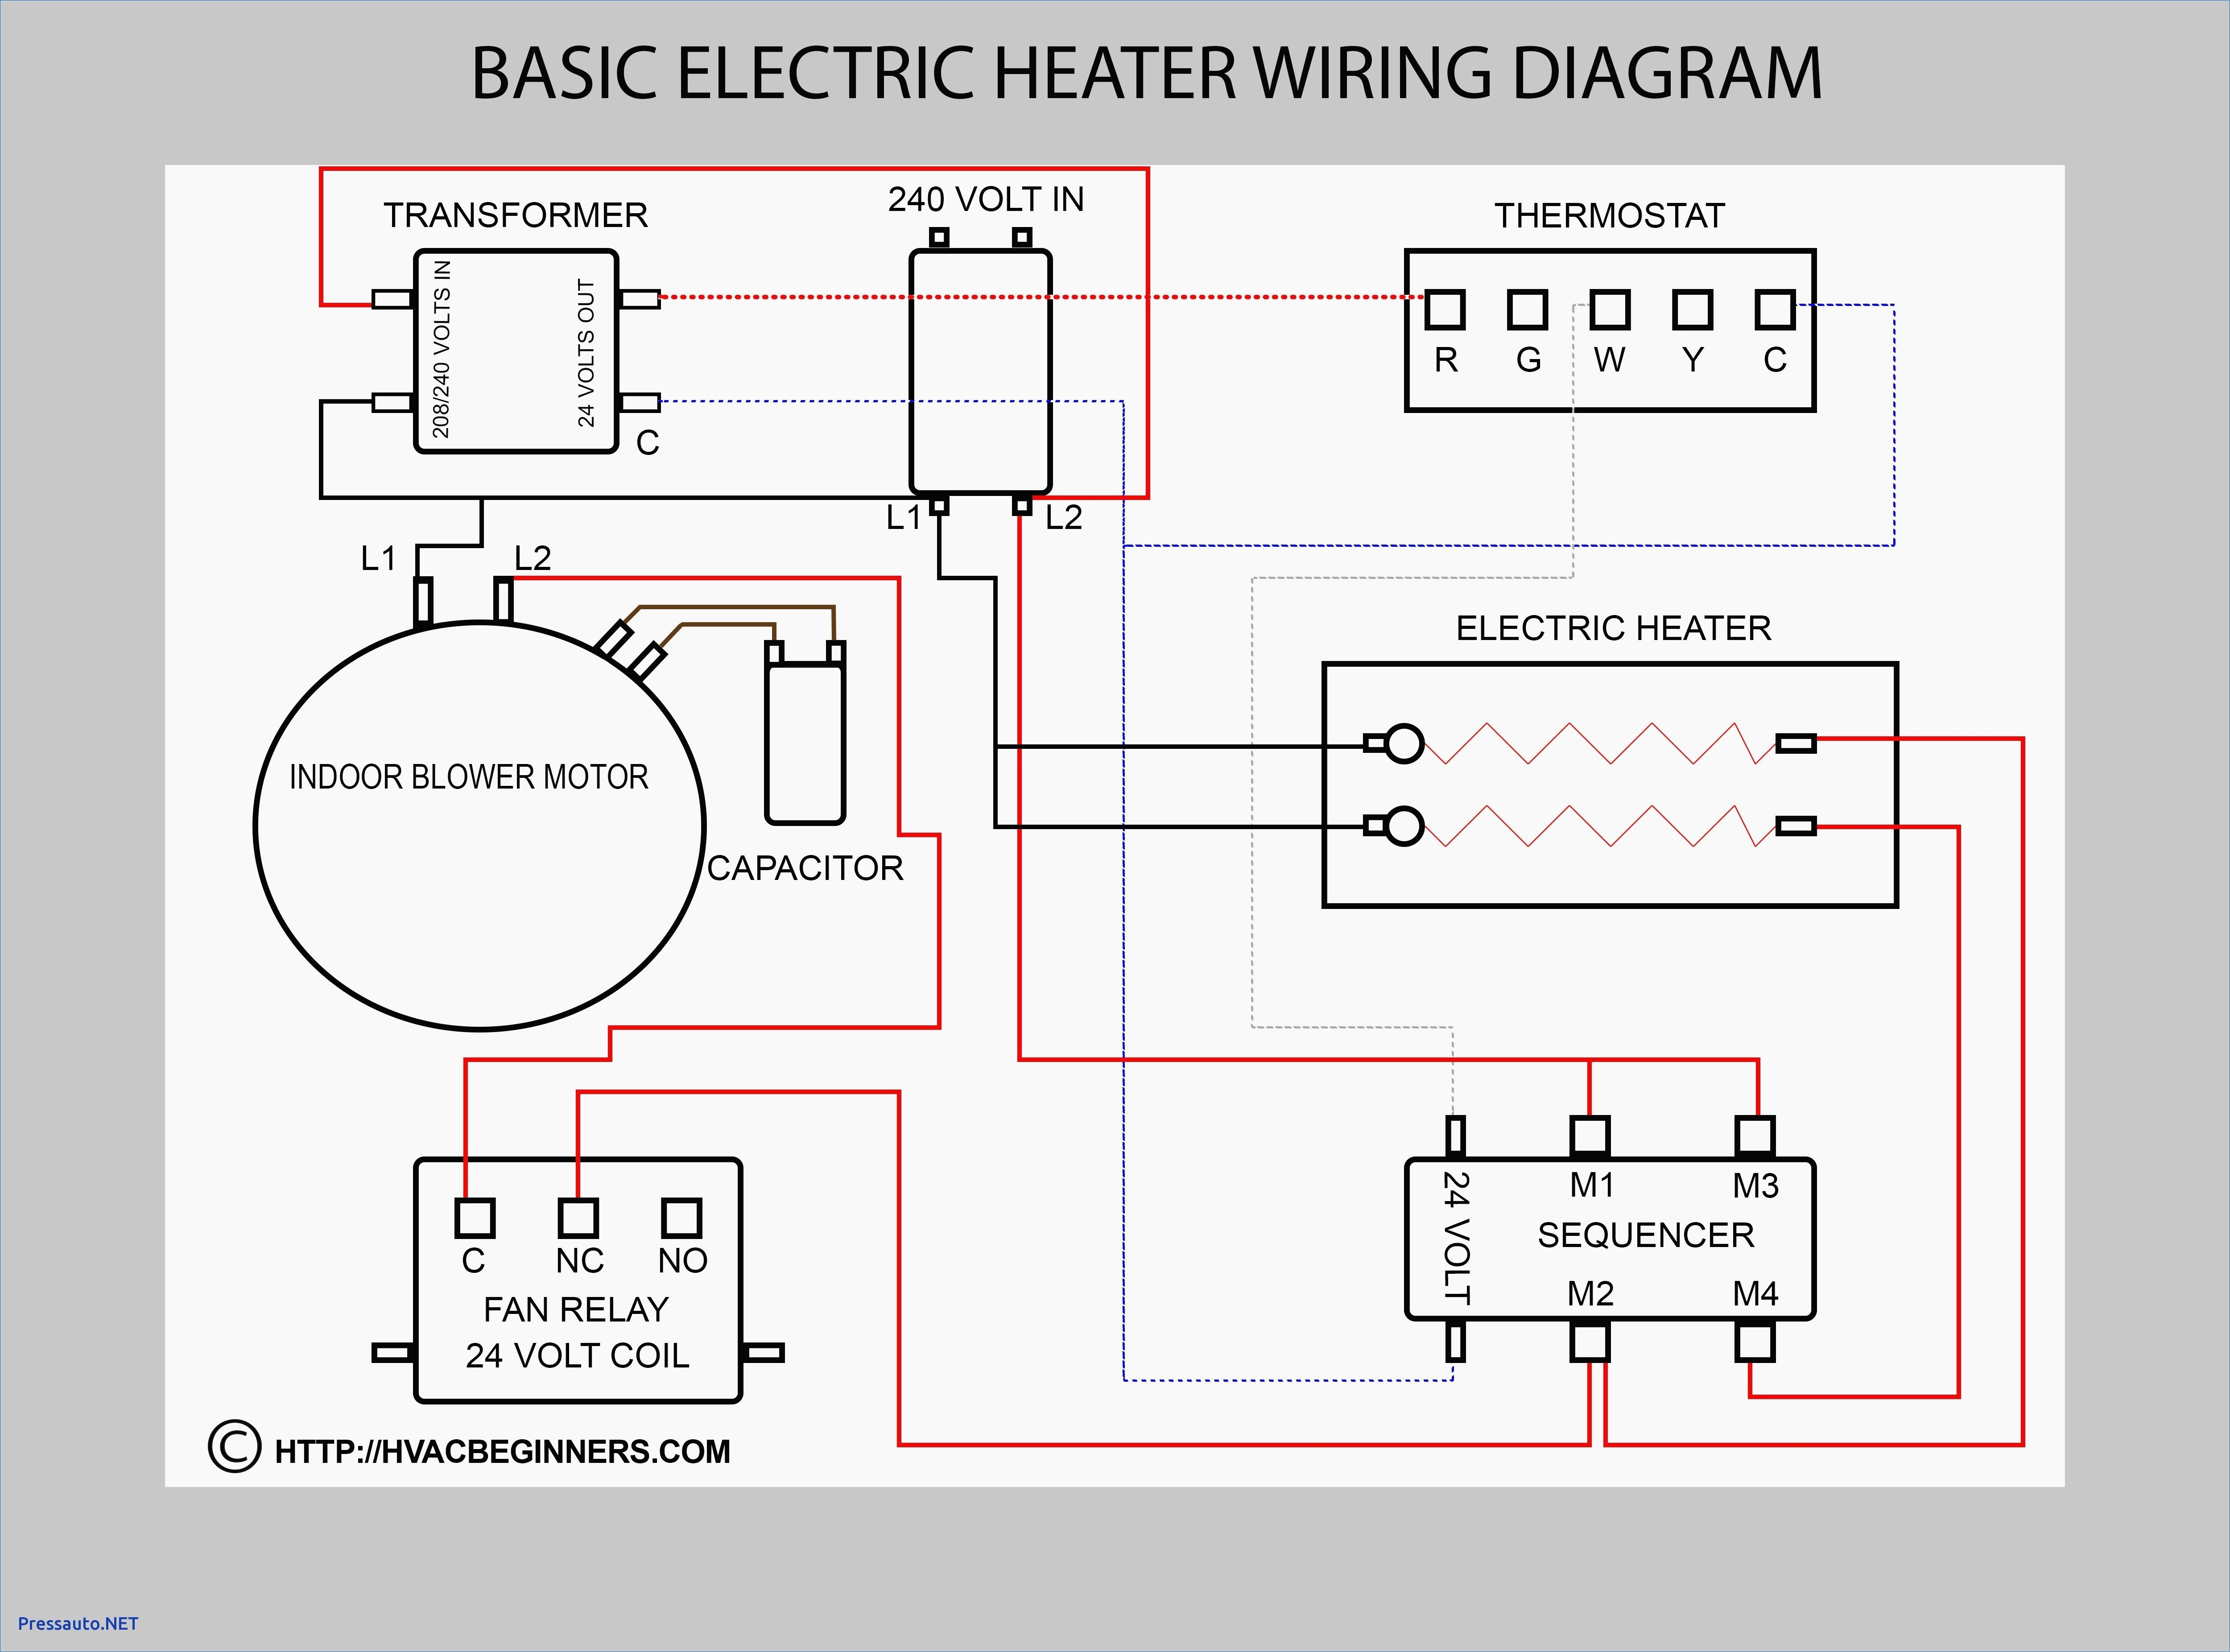 Wickes underfloor heating thermostat wiring diagram wiring diagram electric heat wiring diagram inspirational wiring diagram image rh mainetreasurechest com hvac thermostat electric heat thermostat cheapraybanclubmaster Choice Image